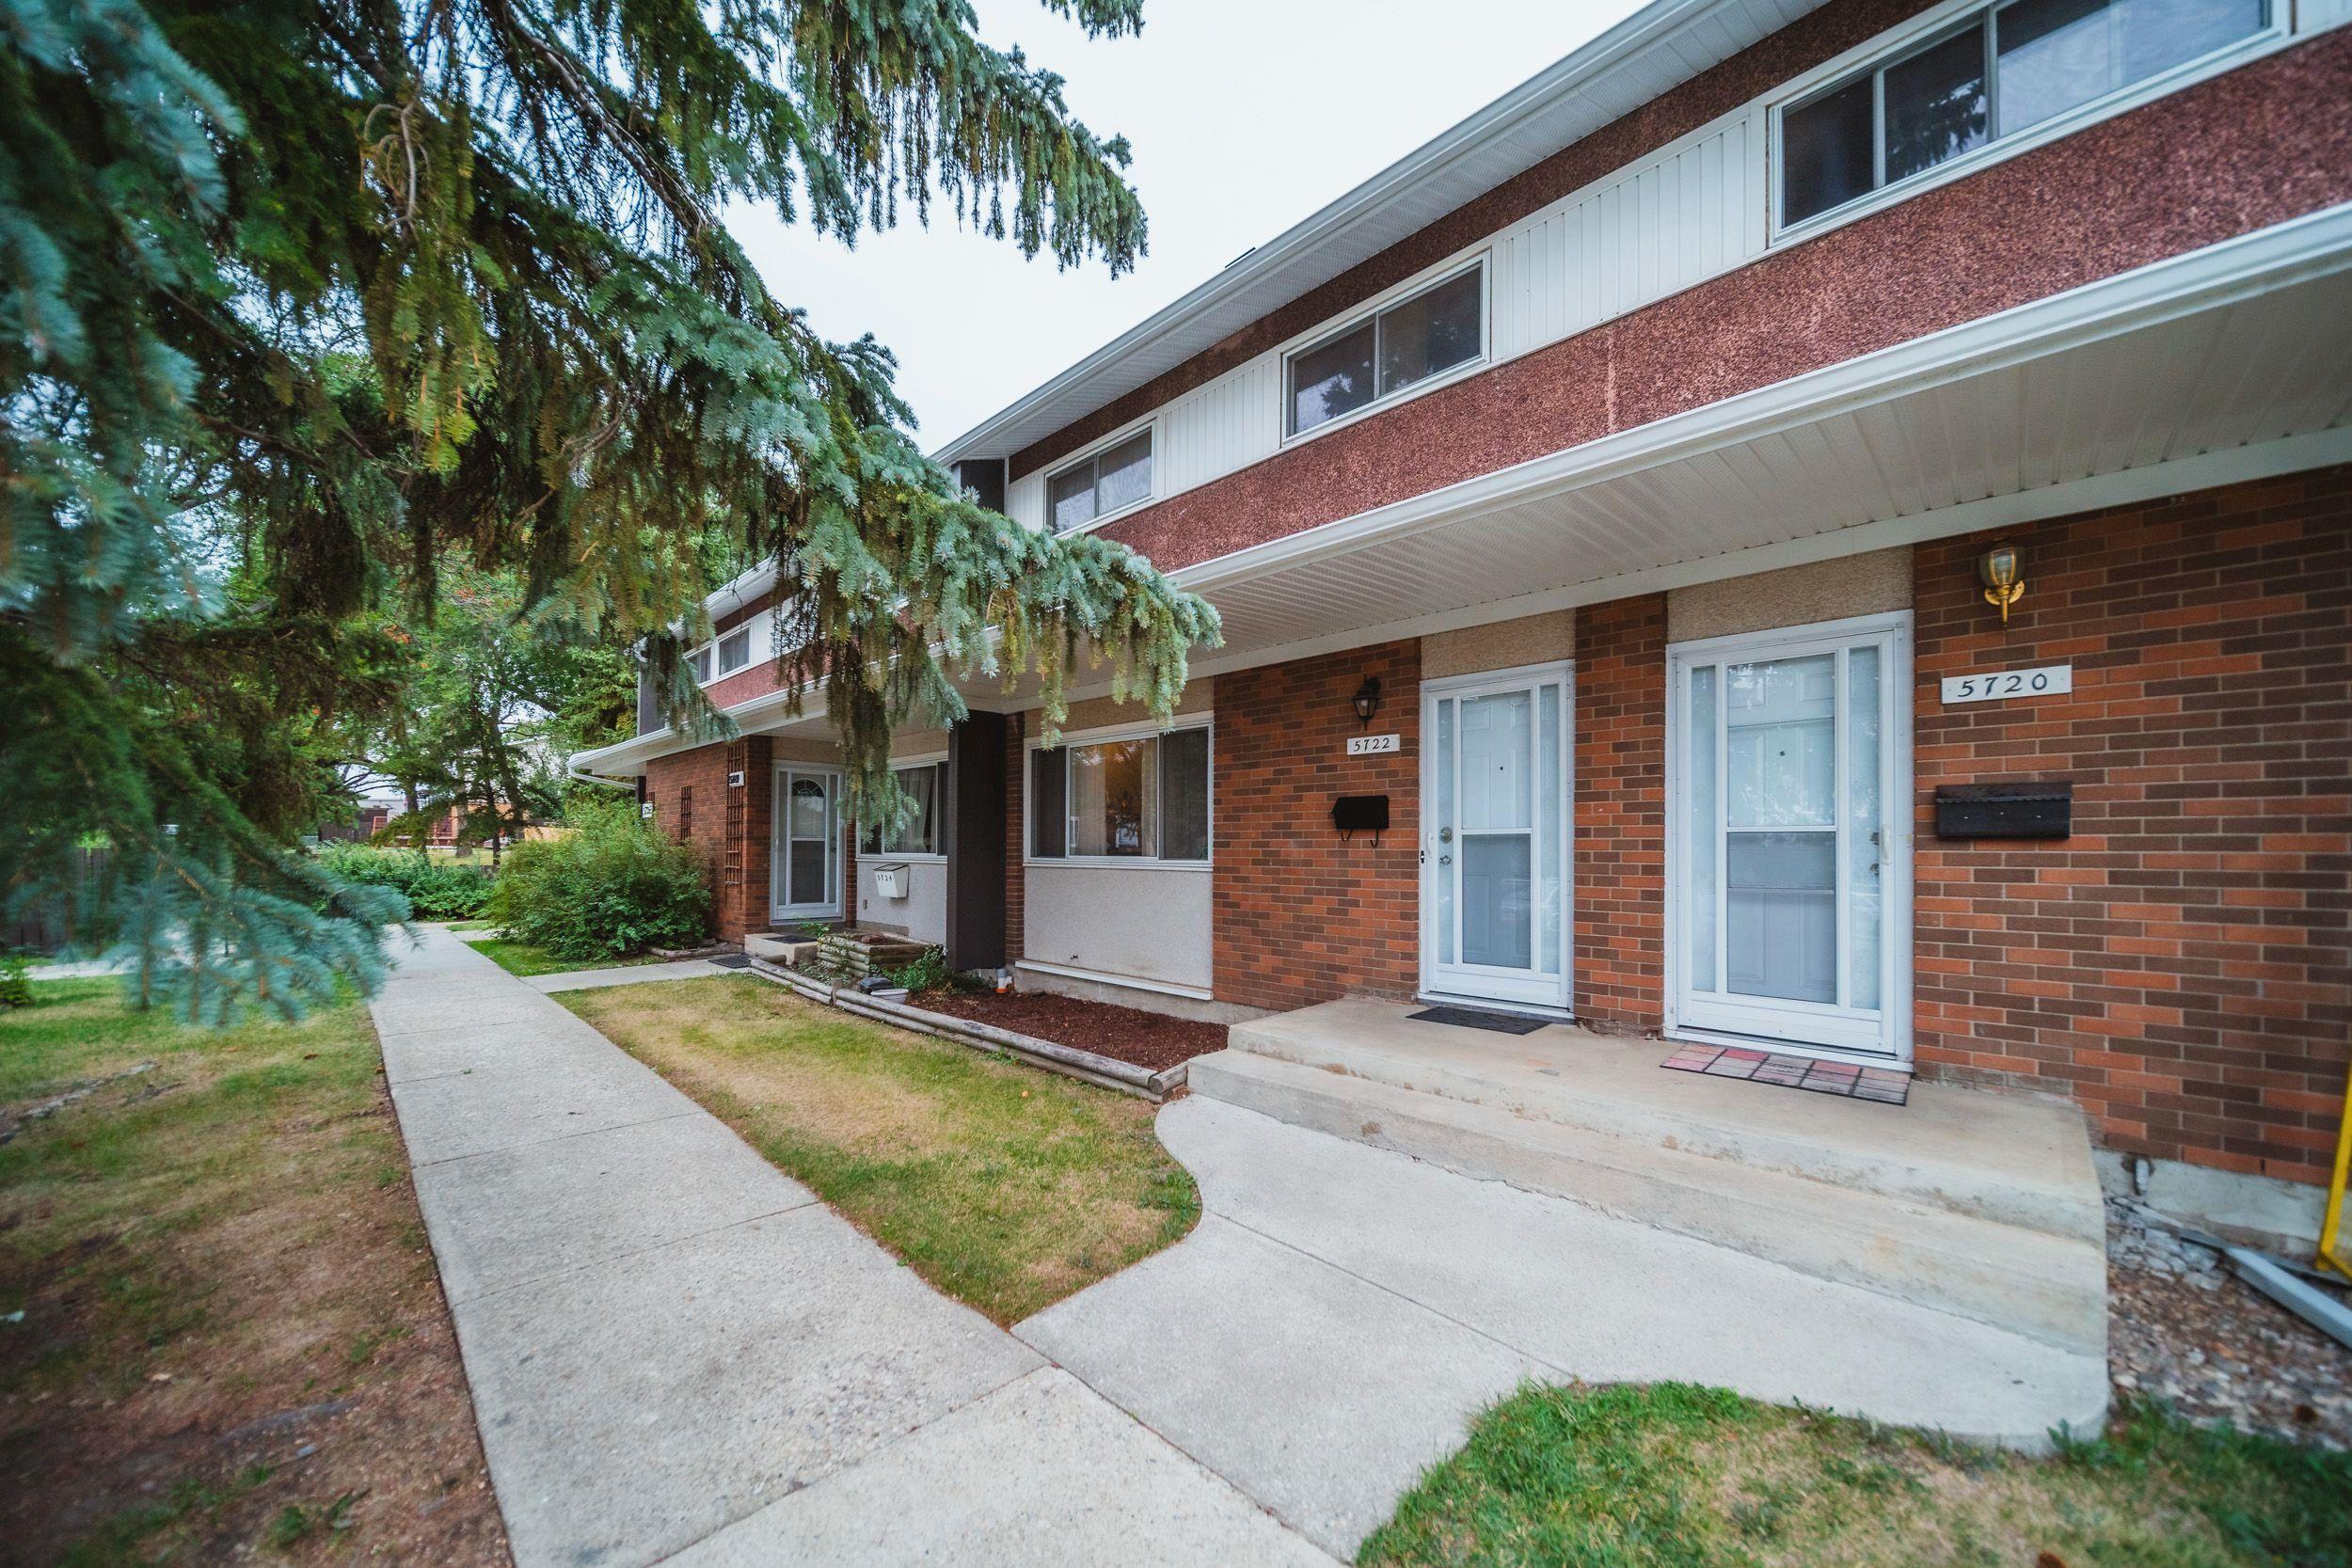 Main Photo: 5722 143 Avenue in Edmonton: Zone 02 Townhouse for sale : MLS®# E4262673